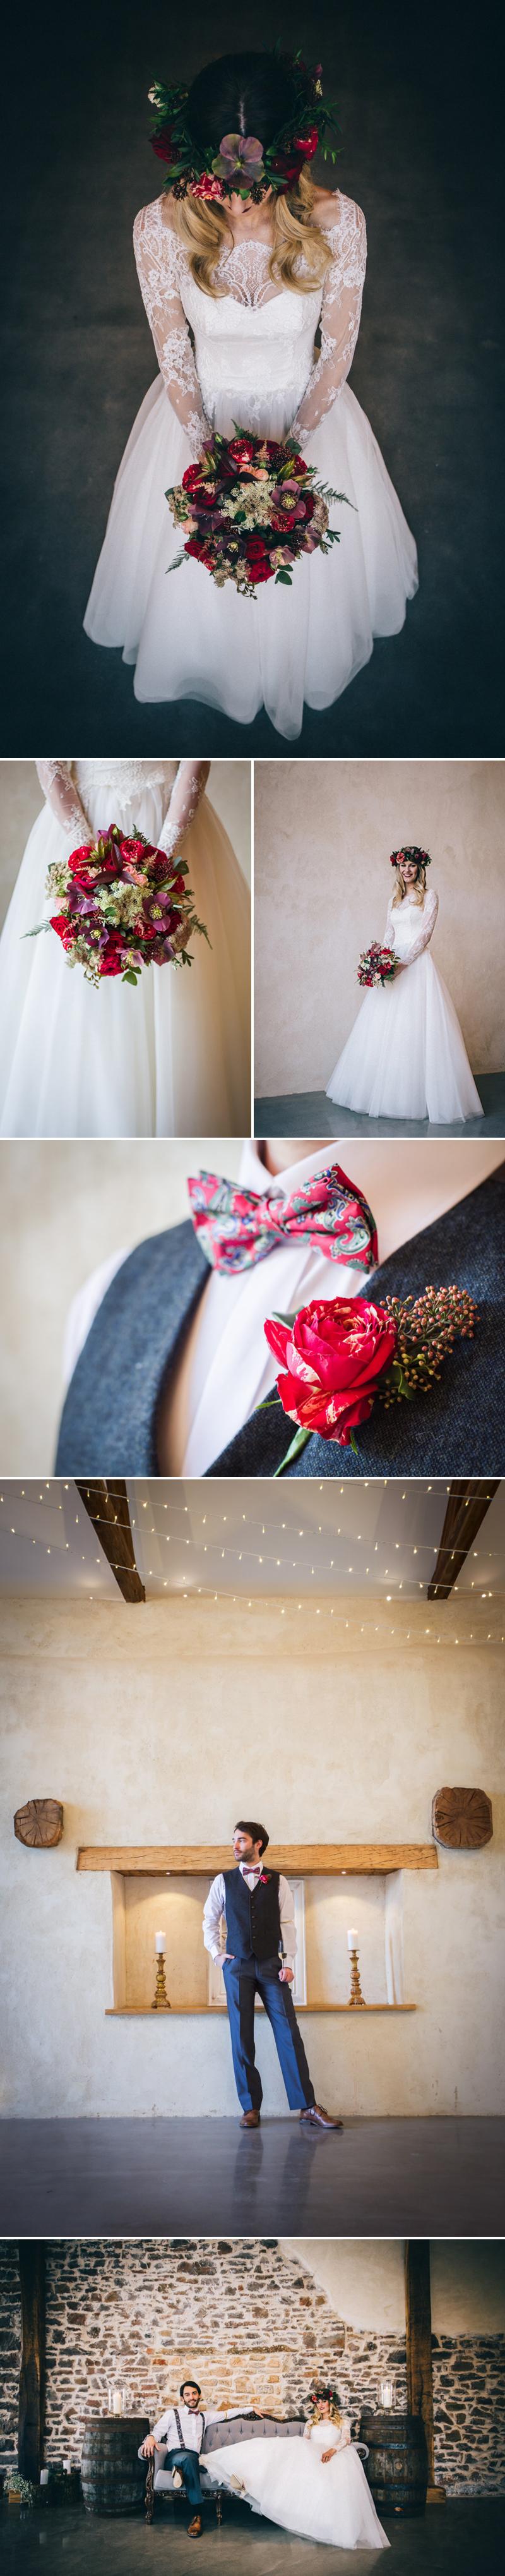 wedding-venues-in-devon-uk-wedding-venue-directory-upton-barn-and-walled-garden-marsala-inspired-styled-shoot-coco-wedding-venues-002